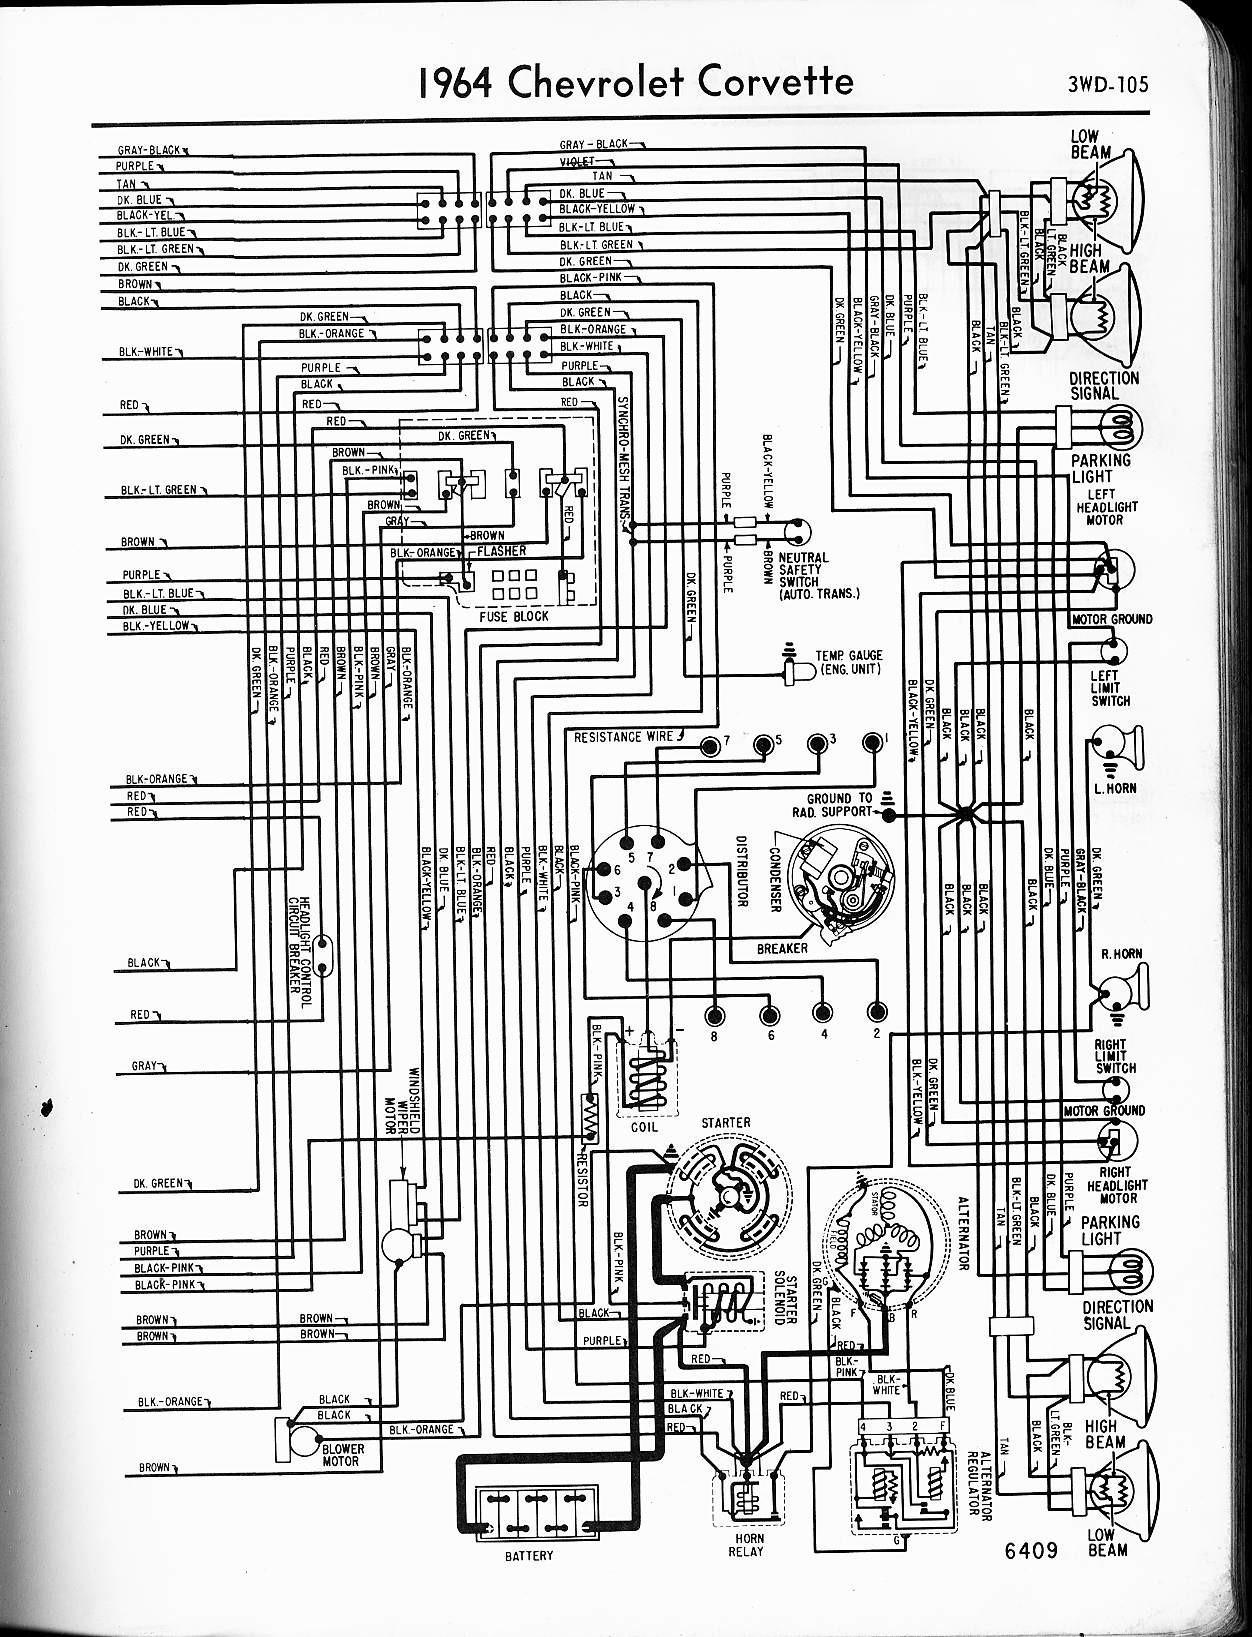 1995 Chevy Silverado Ac Wiring Diagram from wiringall.com